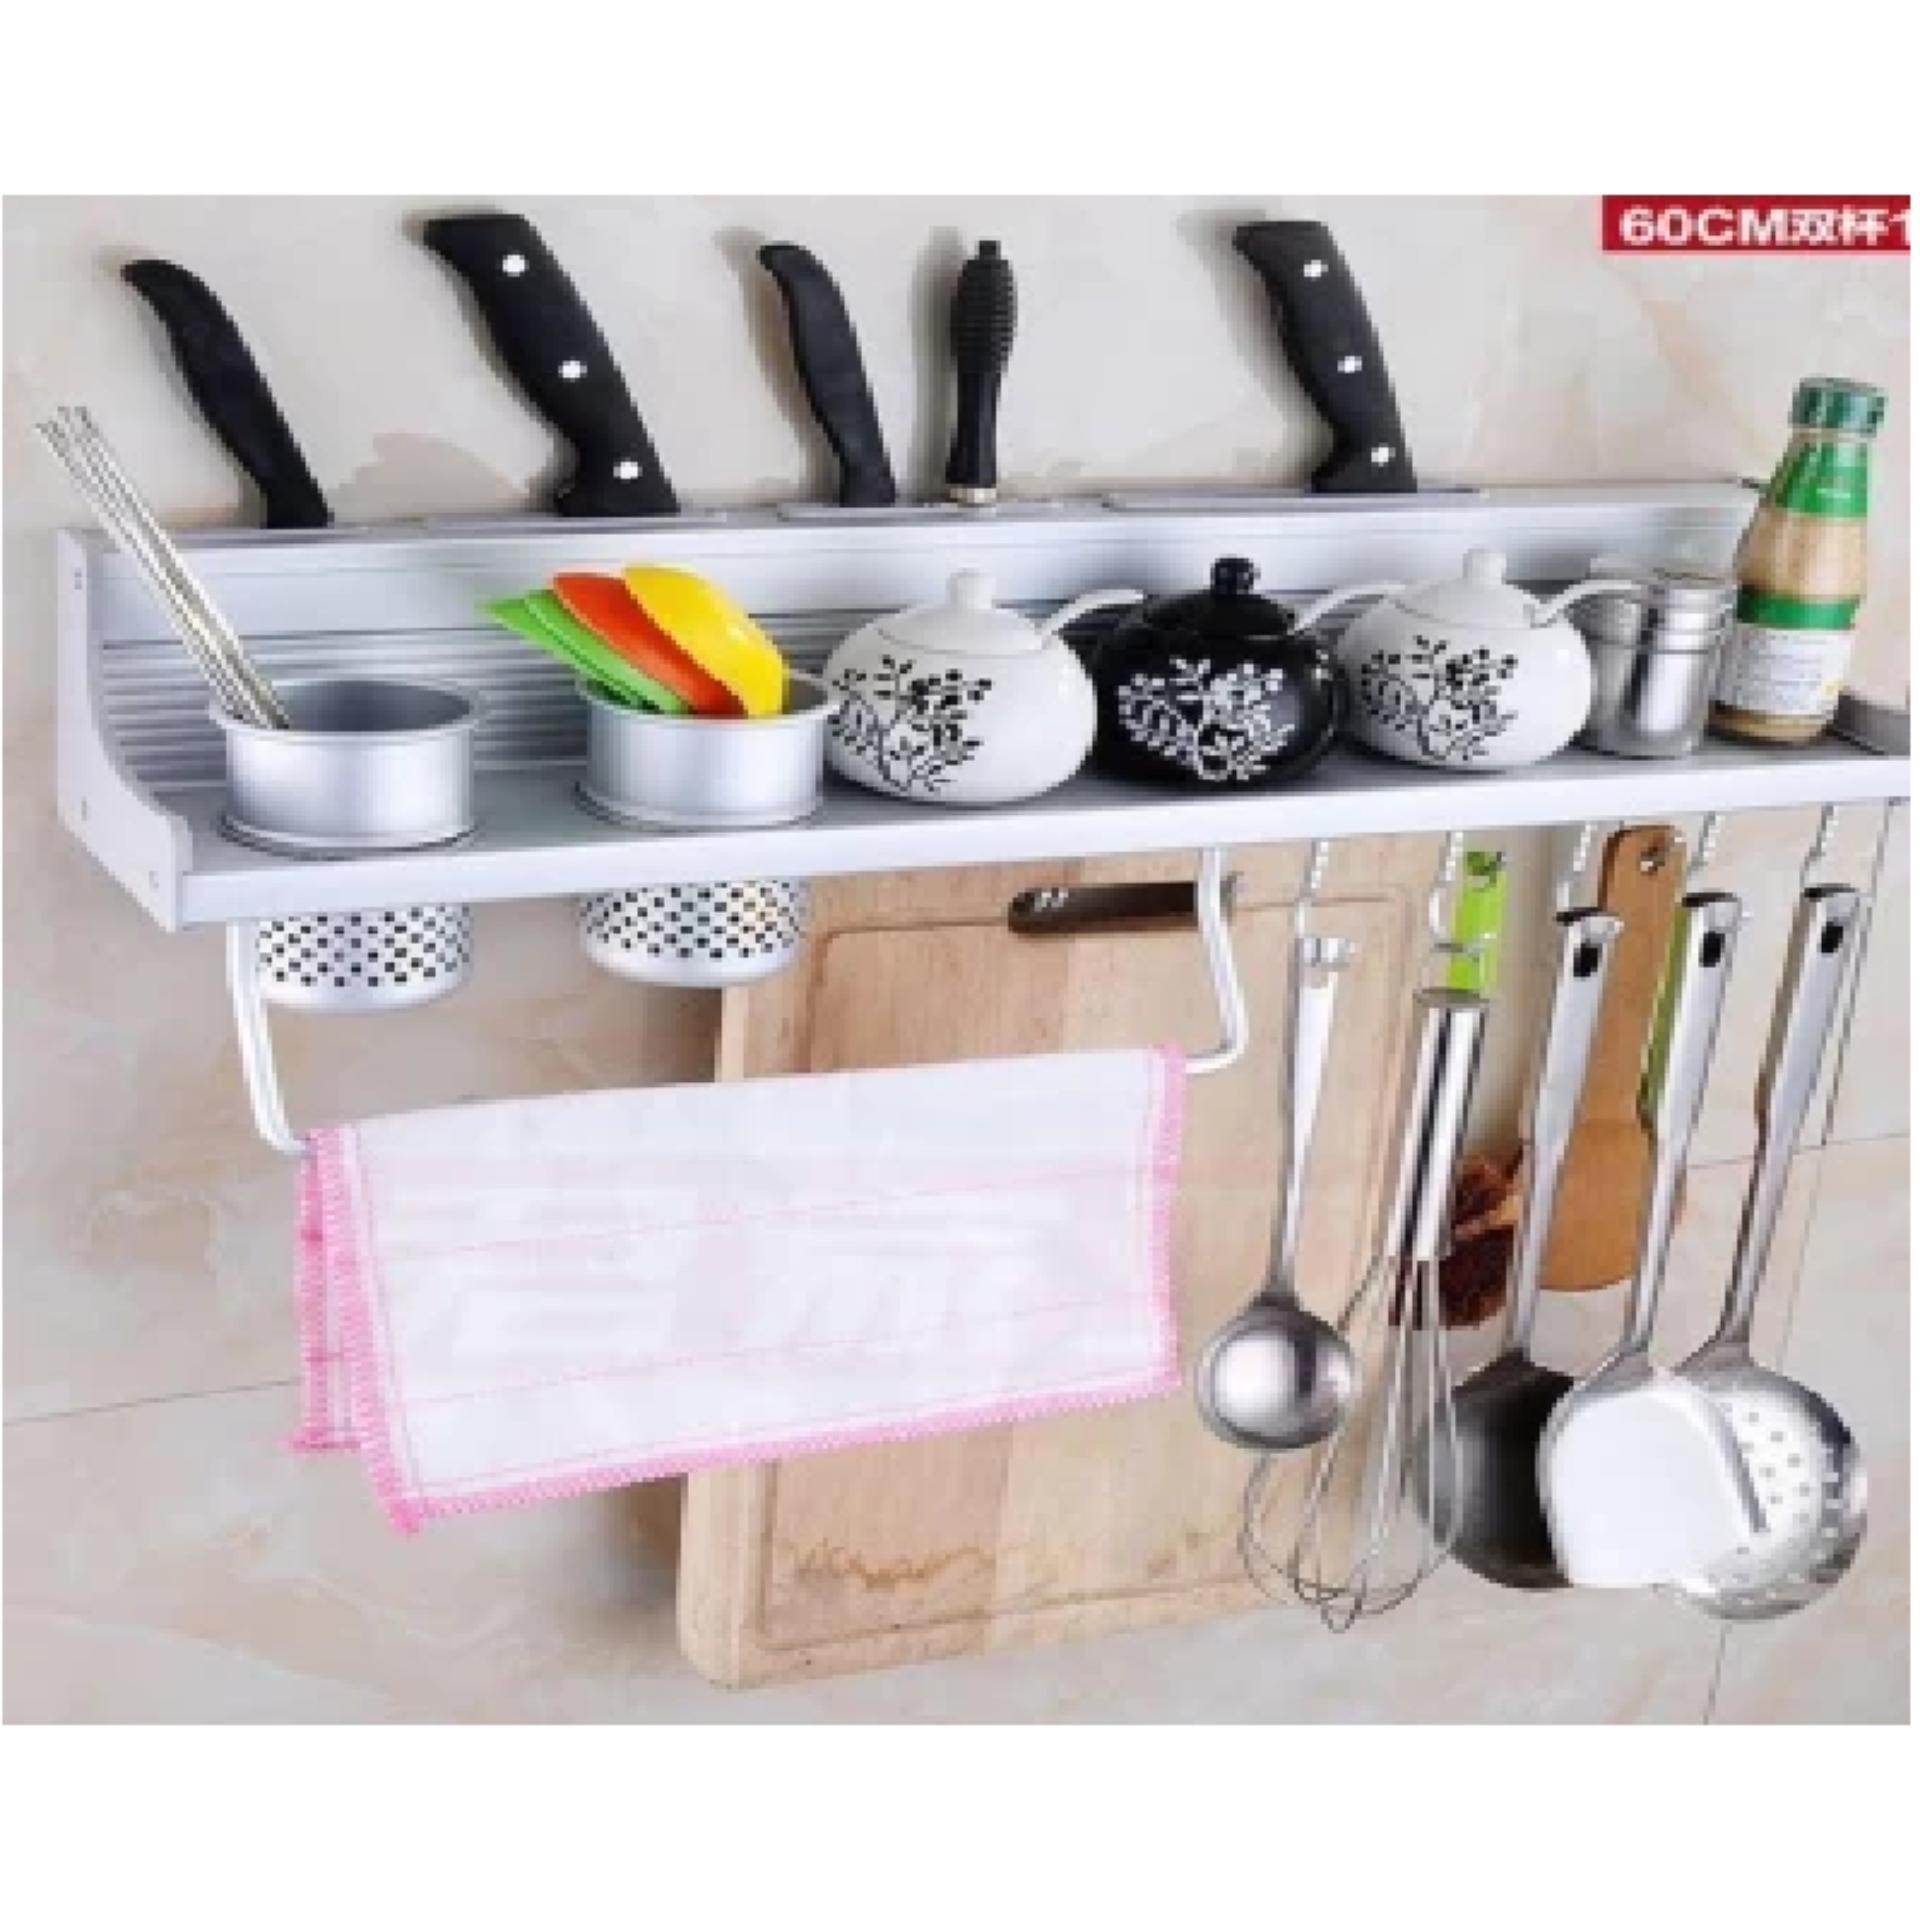 Aluminum Kitchen Storage Rack Pantry Pan Pot Organizer CookwareHolder Hooks  Spice Dinnerware Shelf ...